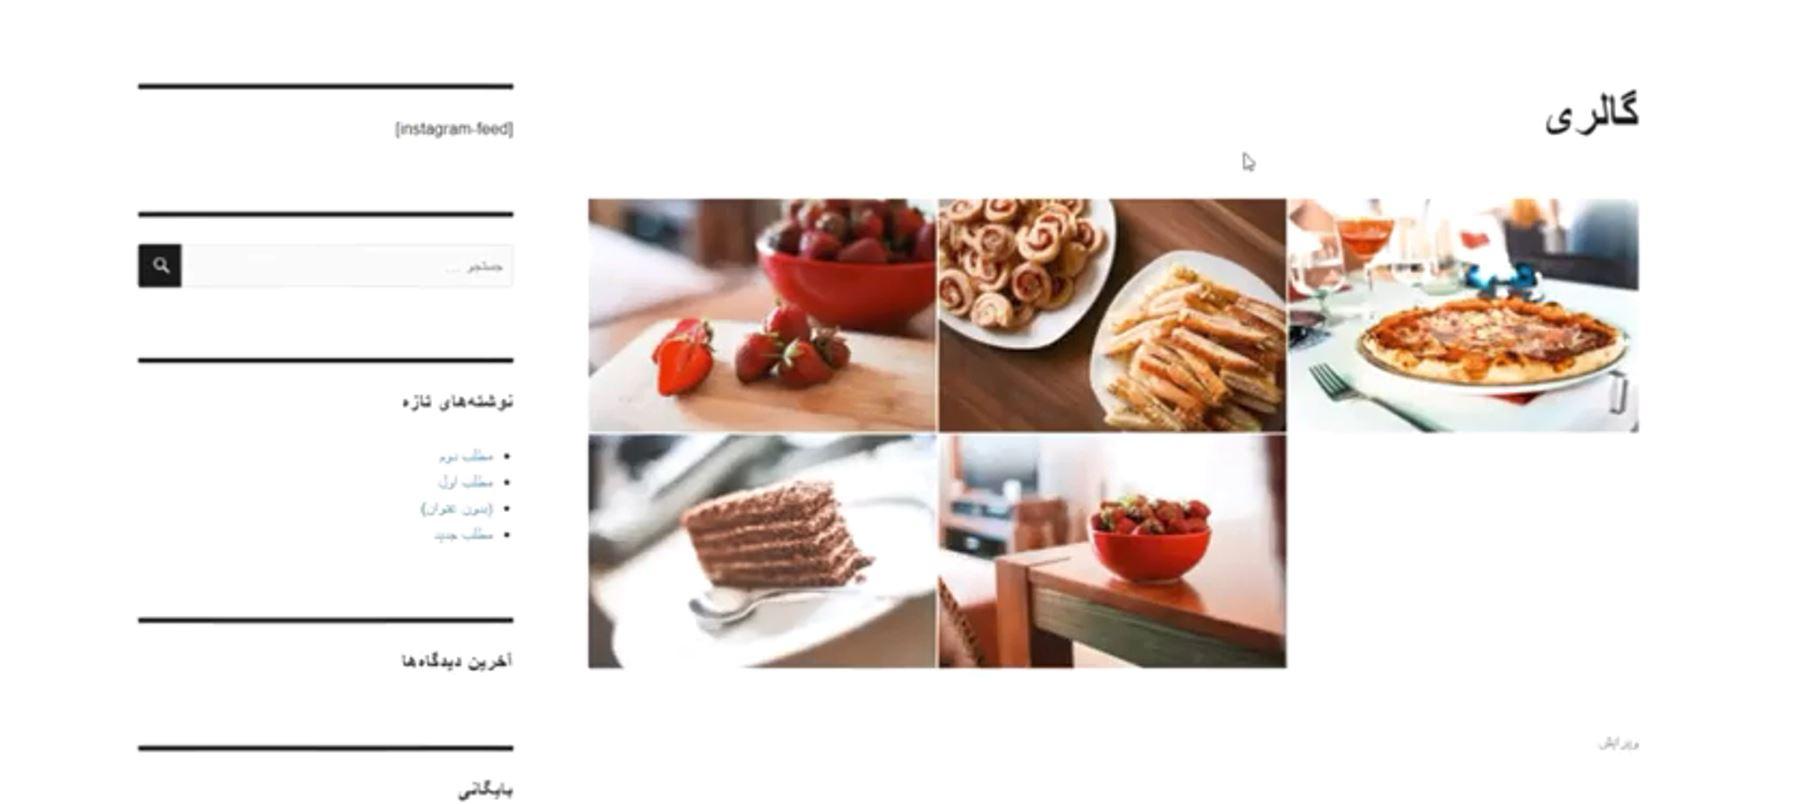 Envira Photo Gallery result